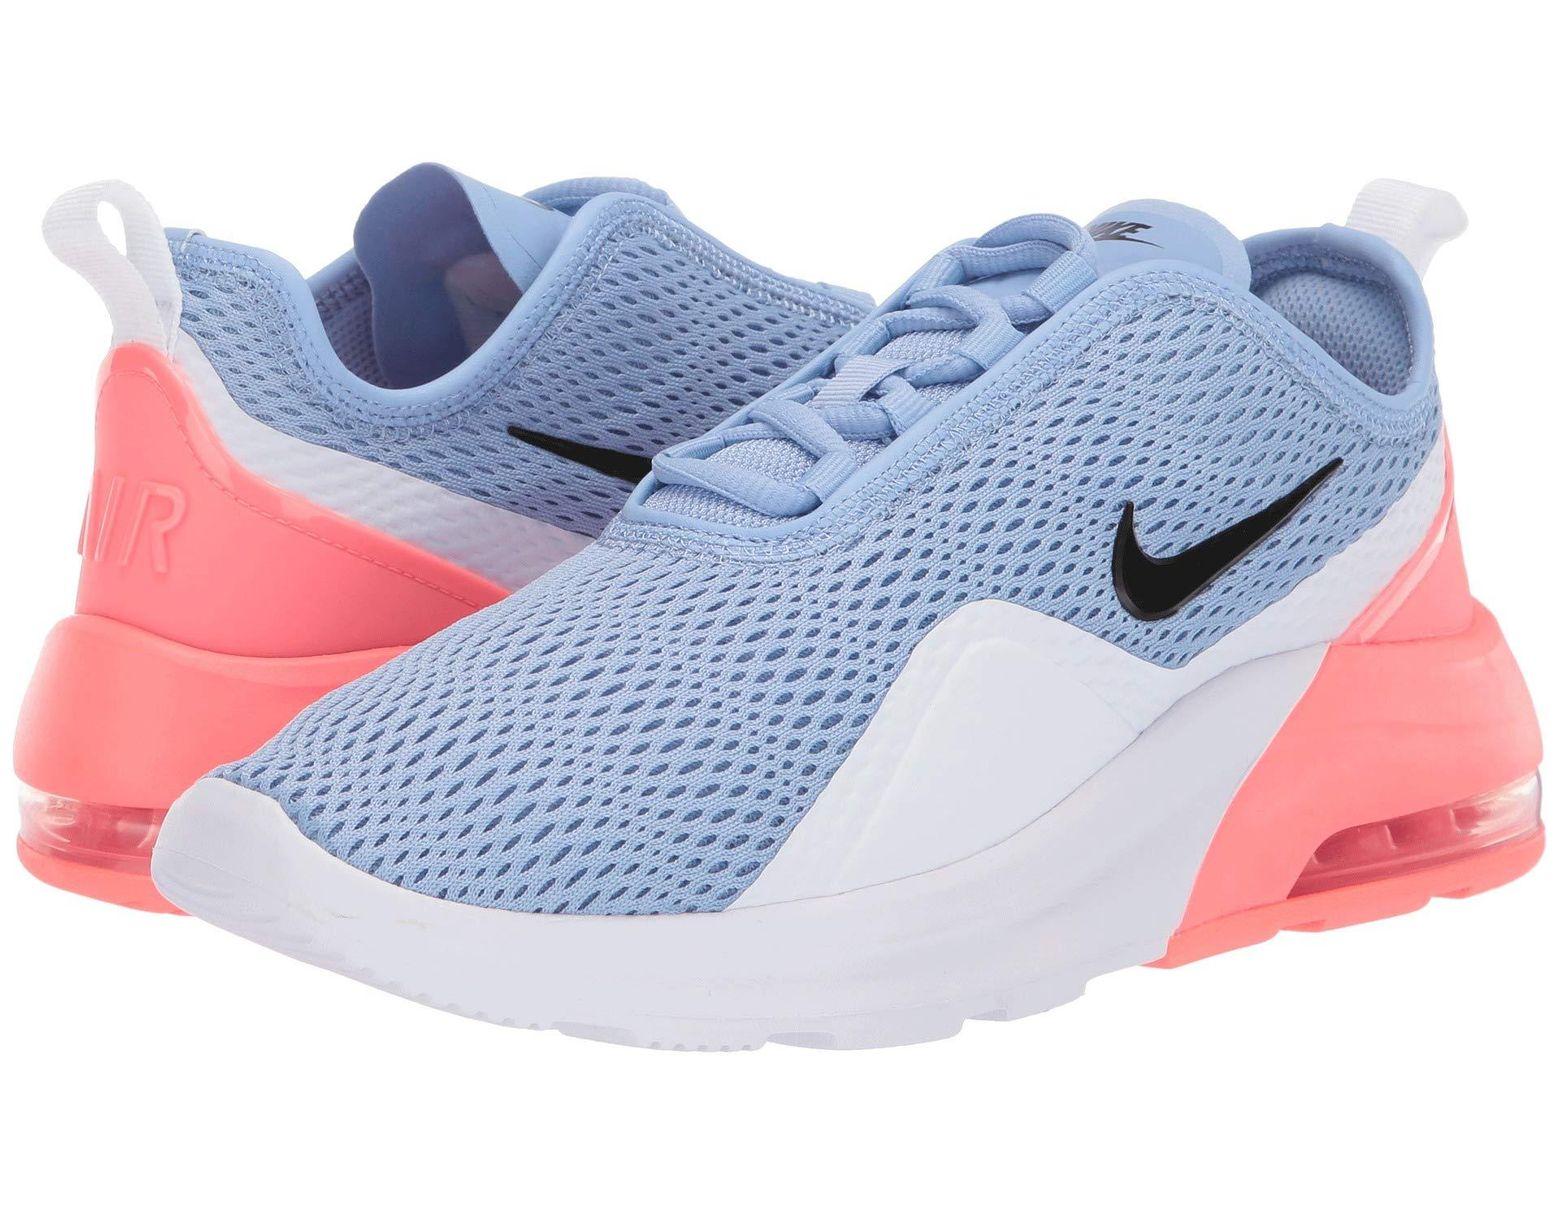 meet 9f3d8 a1ed7 Nike Air Max Motion 2 (white laser Fuchsia pale Pink) Women s Running Shoes  - Lyst